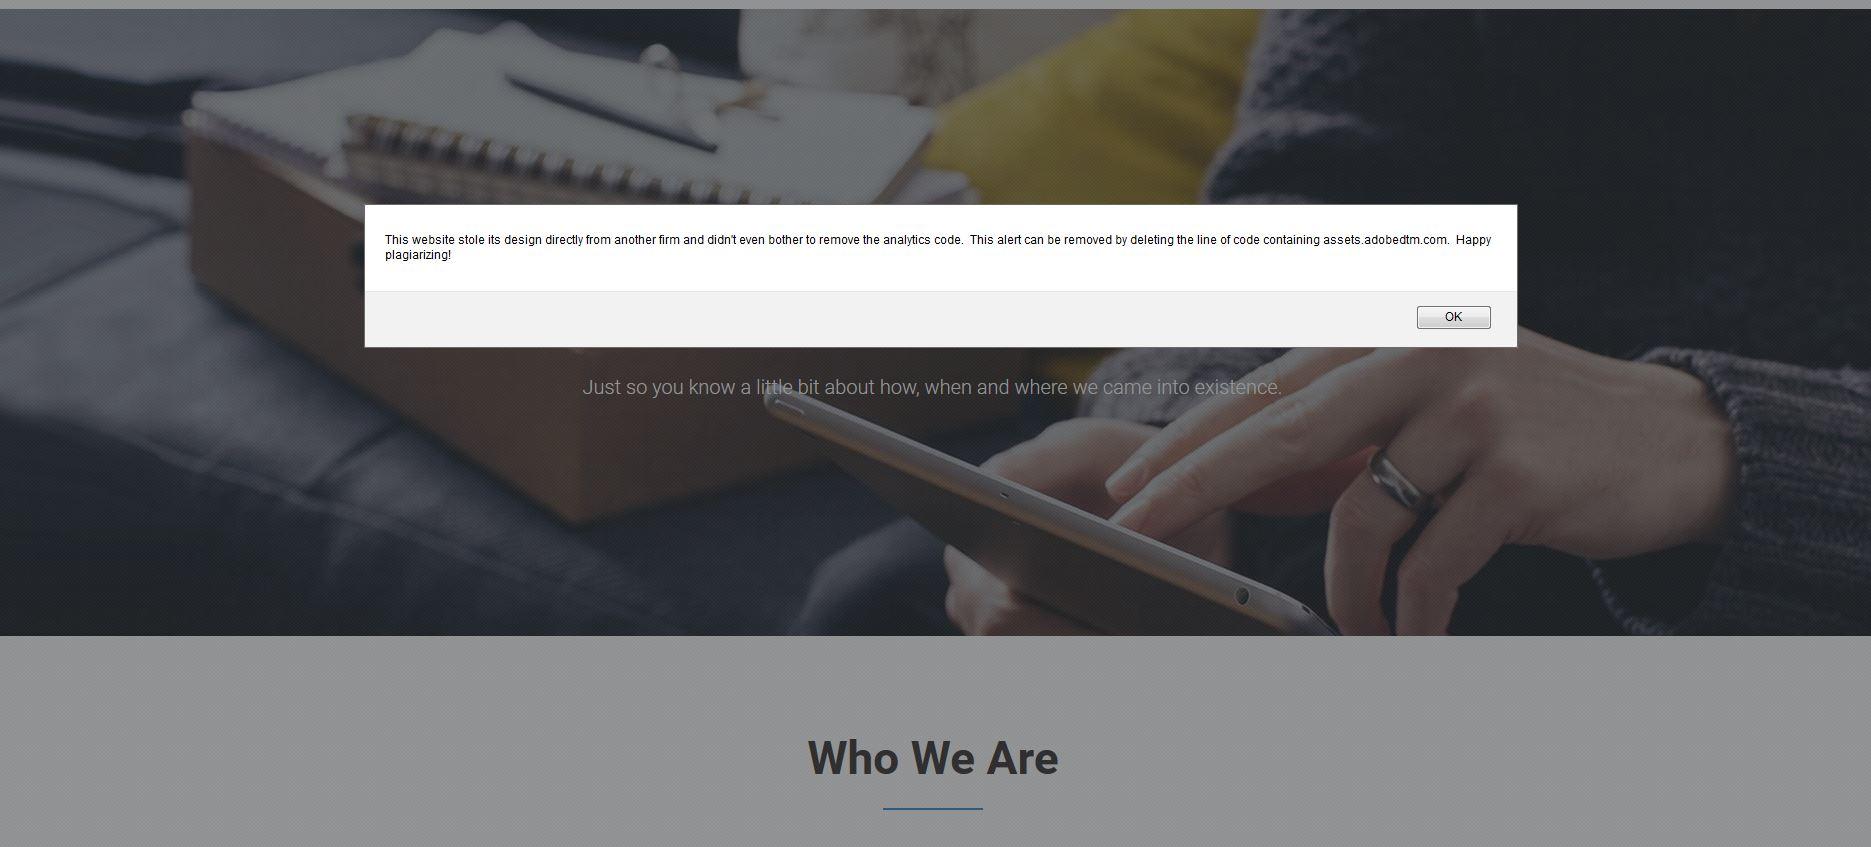 stolen website message